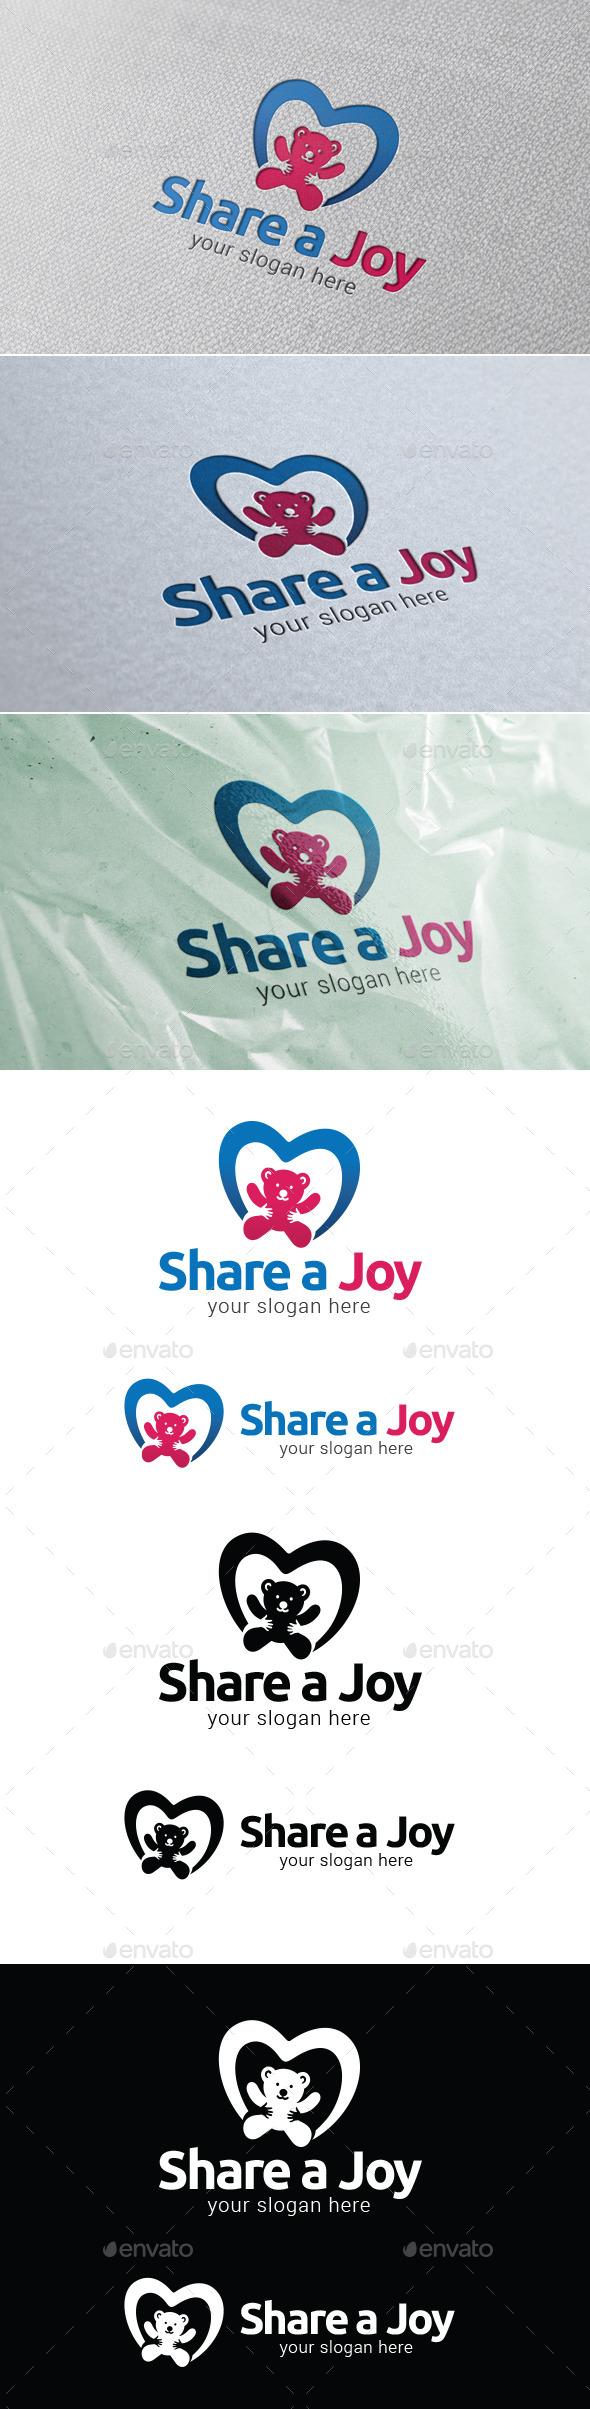 Share A Joy Logo Template - Objects Logo Templates